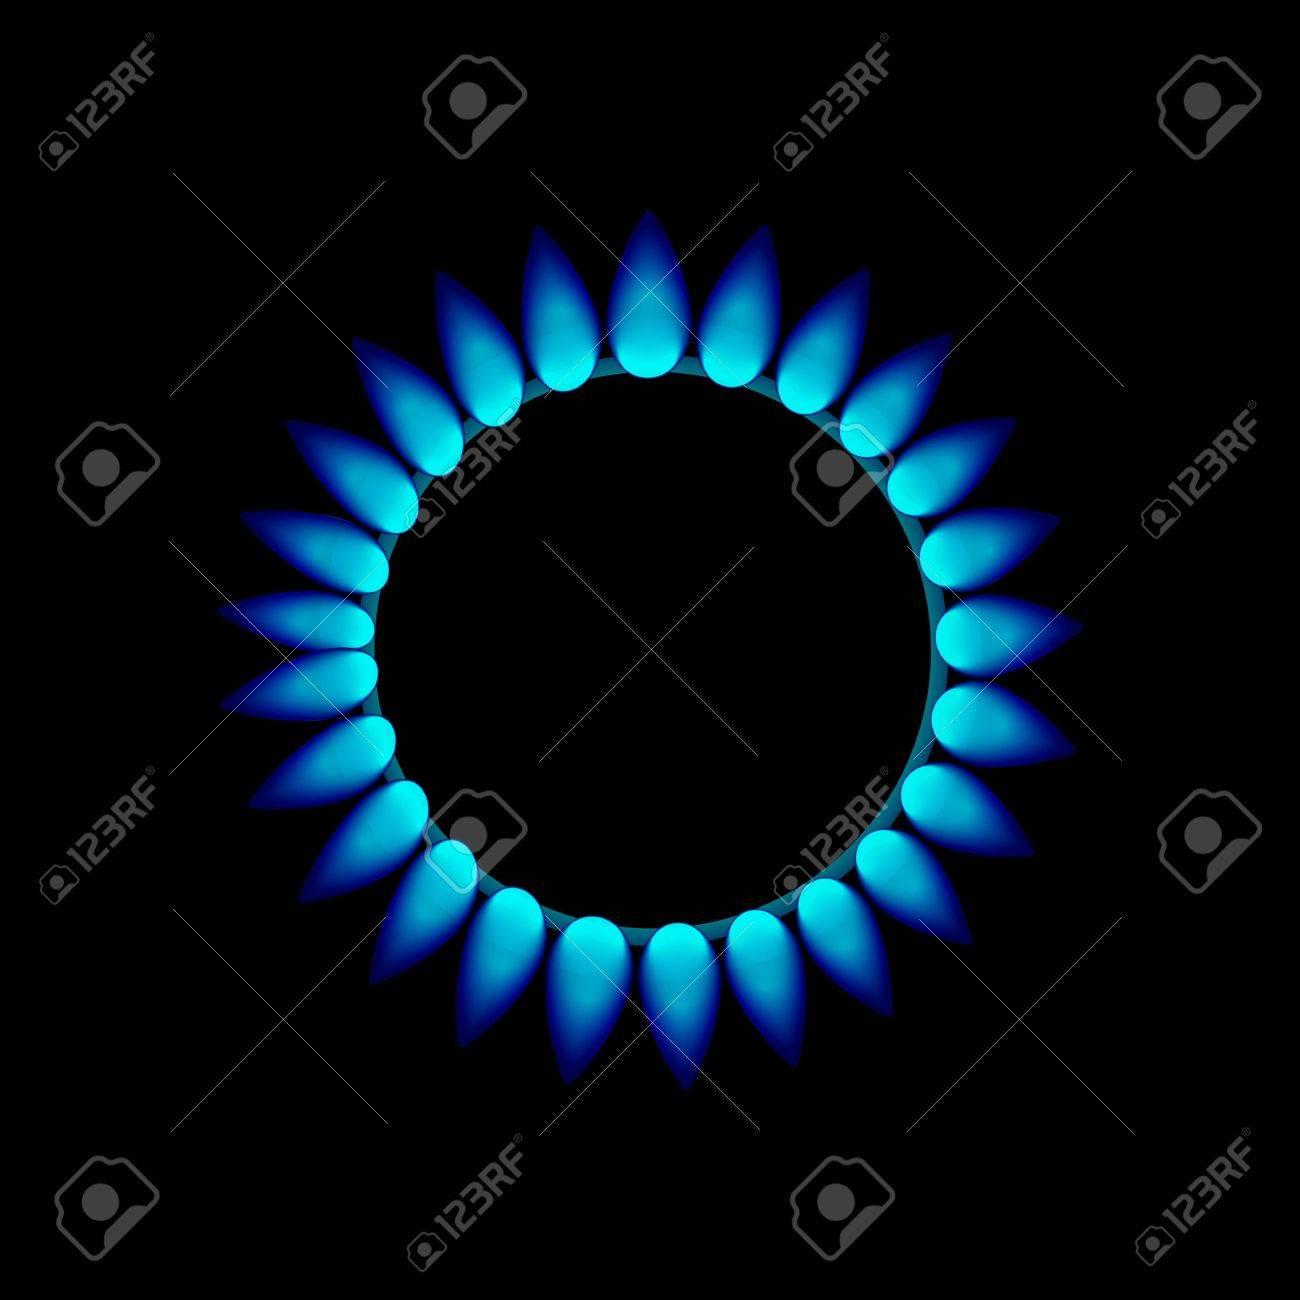 vector flames of gas Stock Photo - 15885524